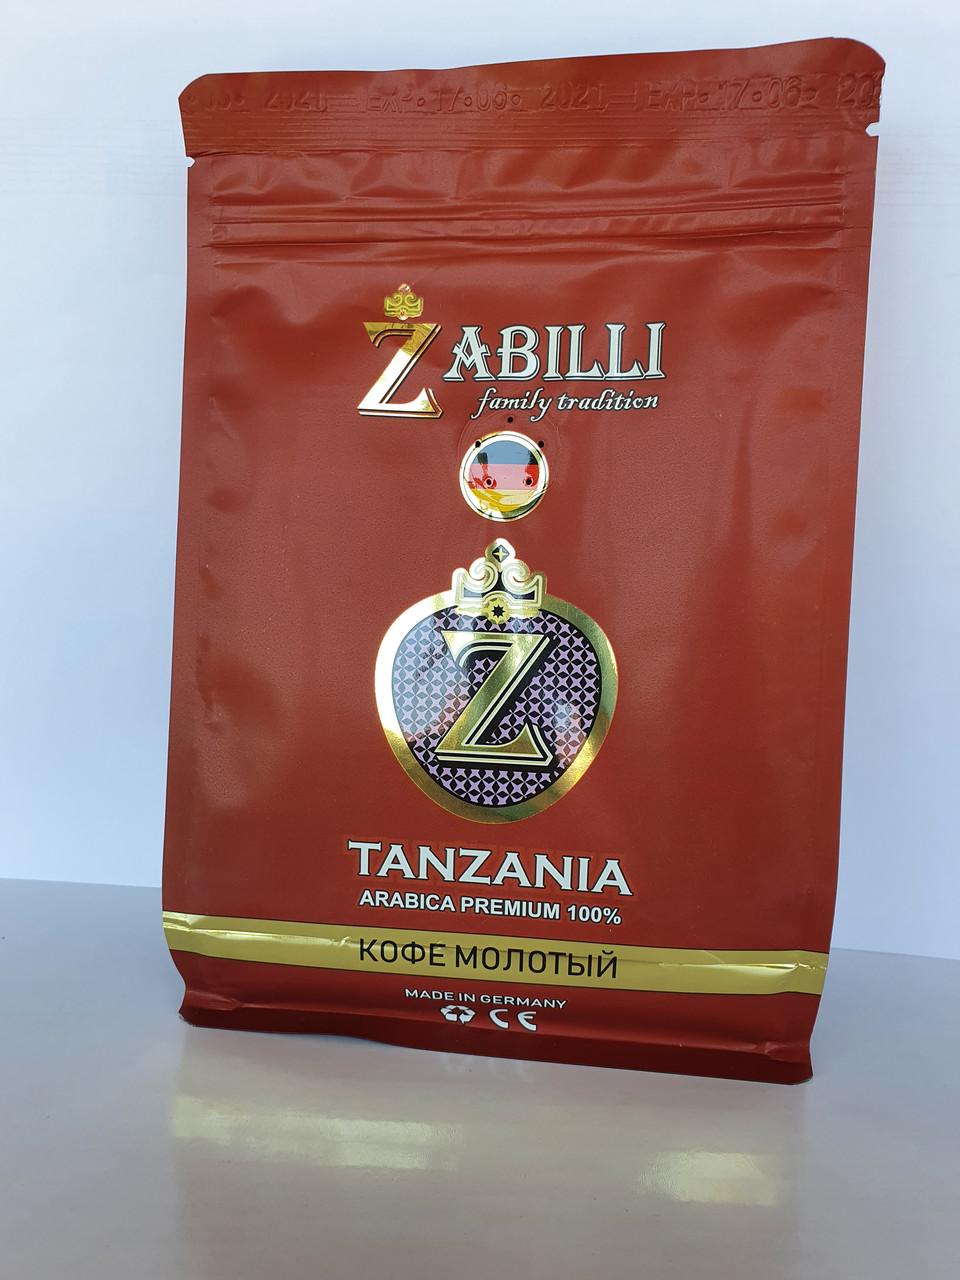 Молотый кофе средней обжарки Zabilli Танзания 100% арабика 250 грамм